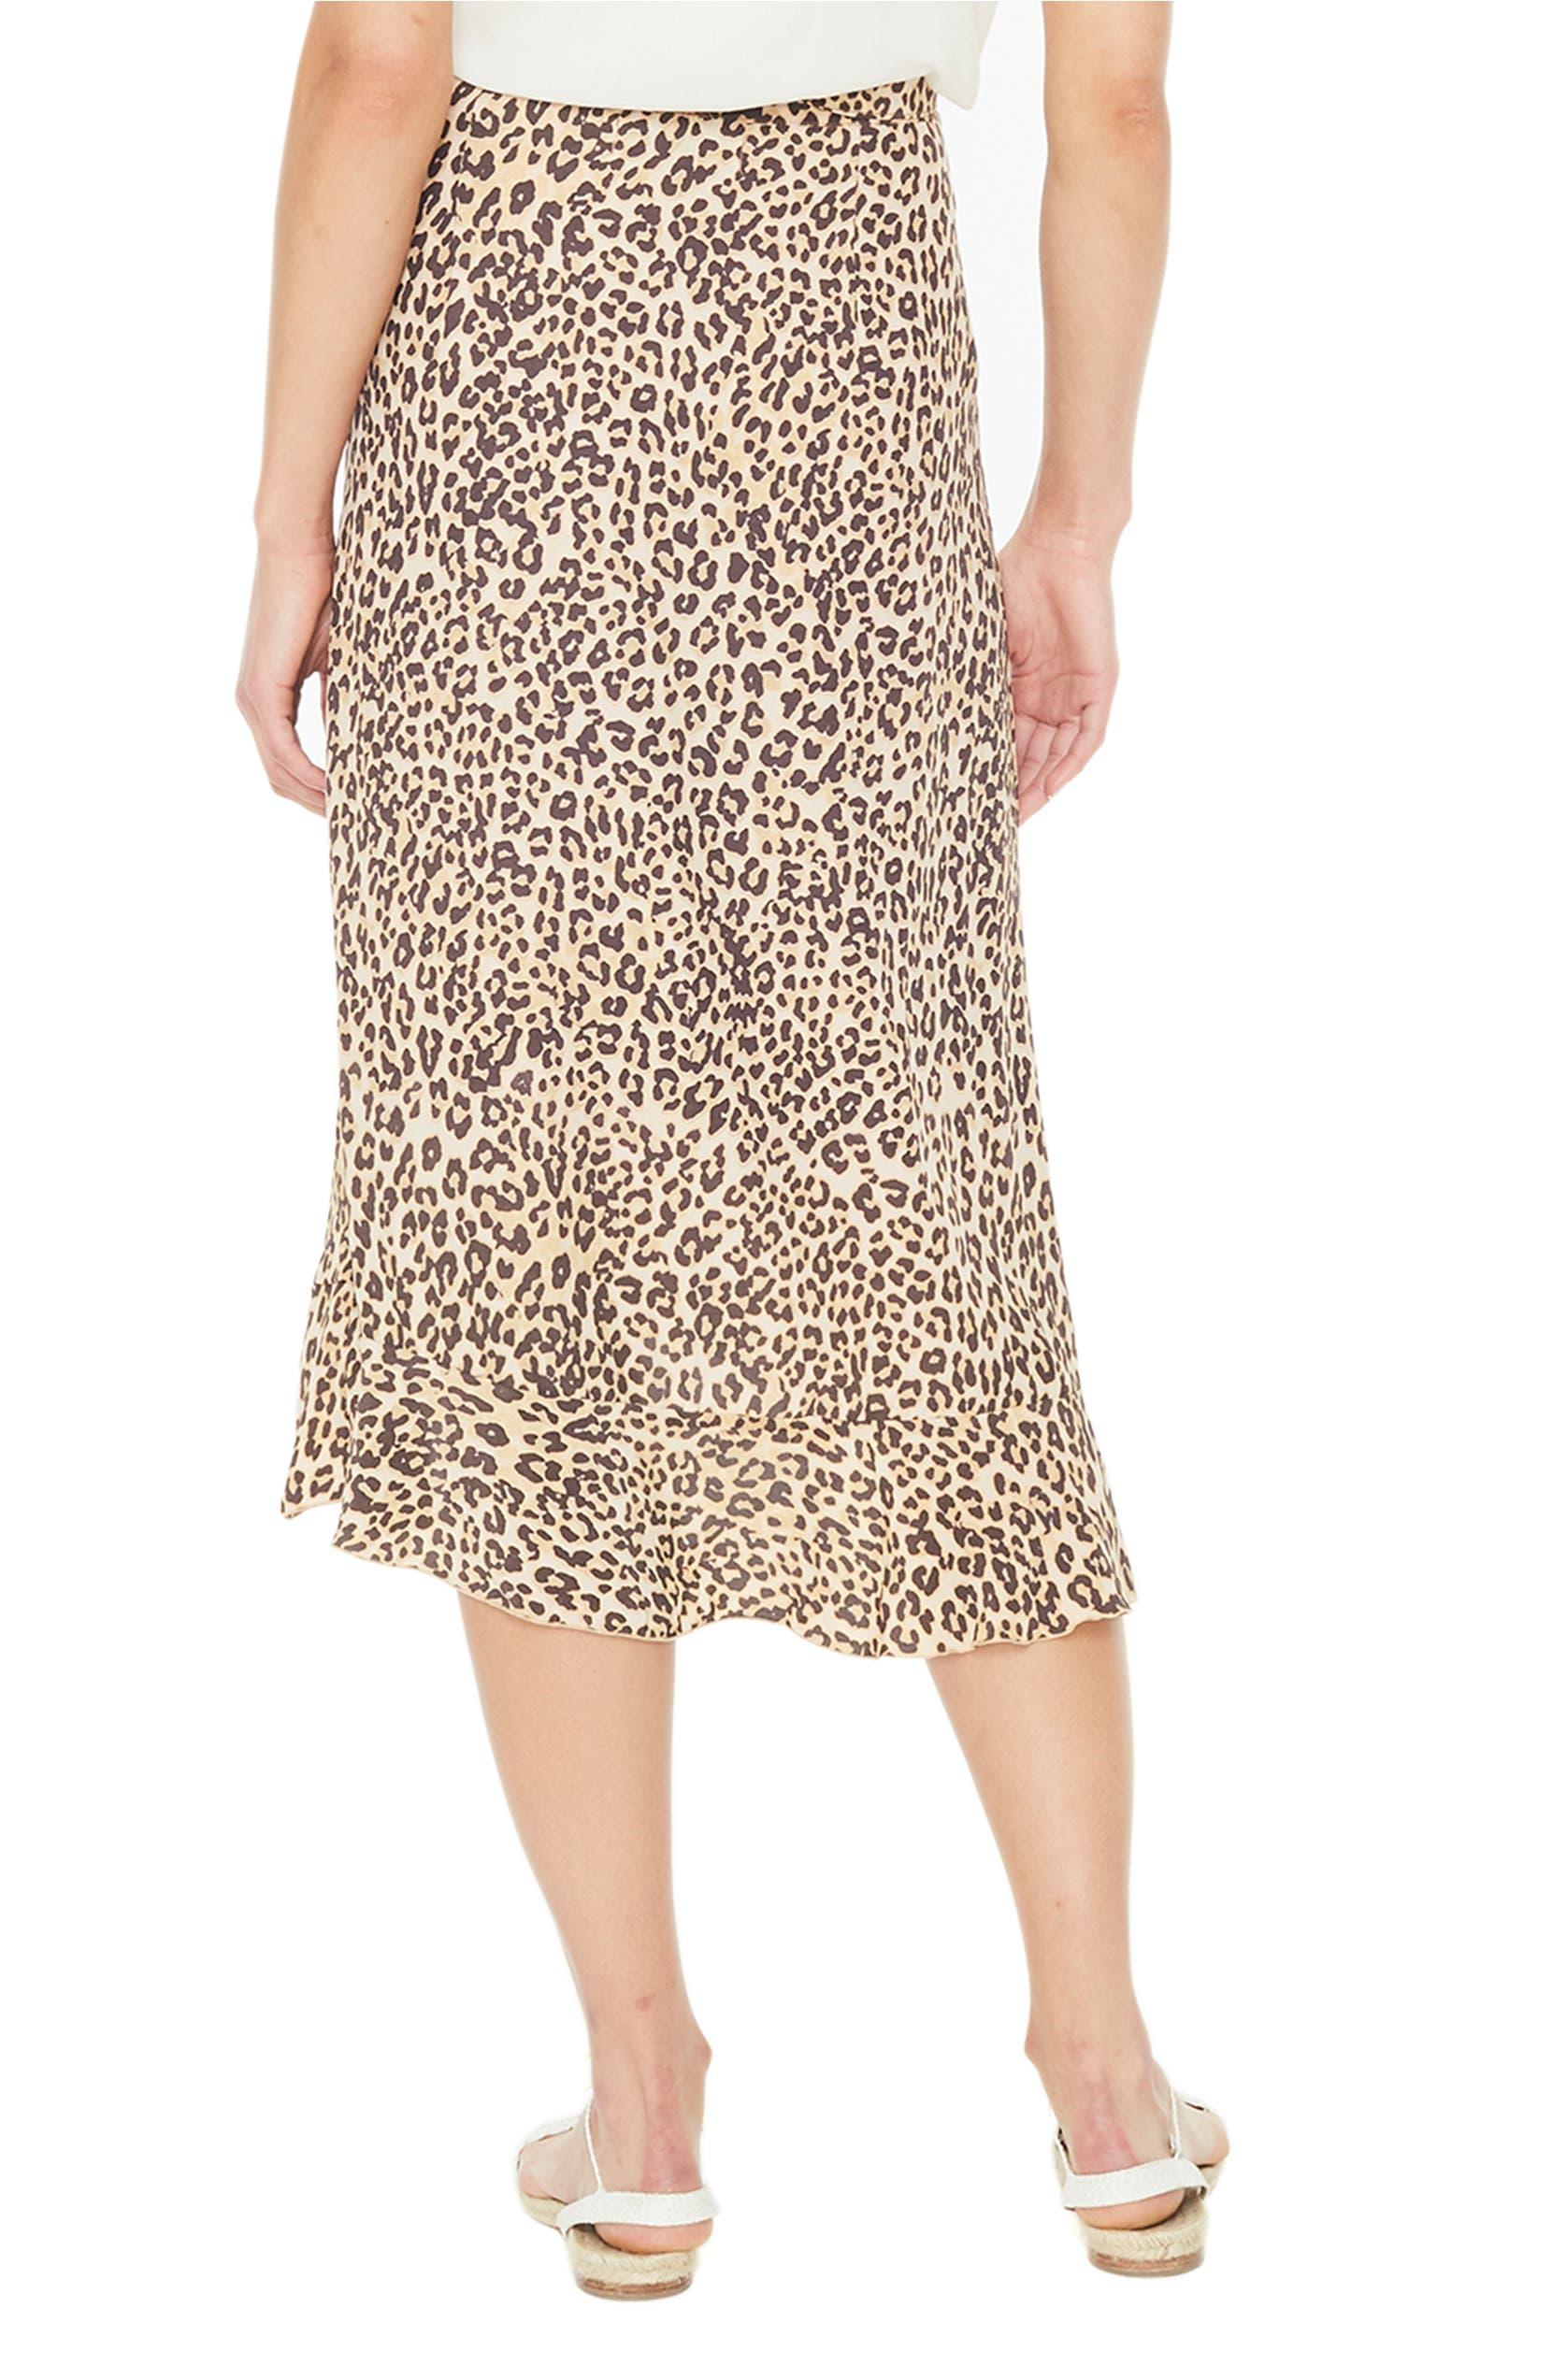 66d31fd7af FAITHFULL THE BRAND Celeste Leopard Print Wrap Skirt   Nordstrom